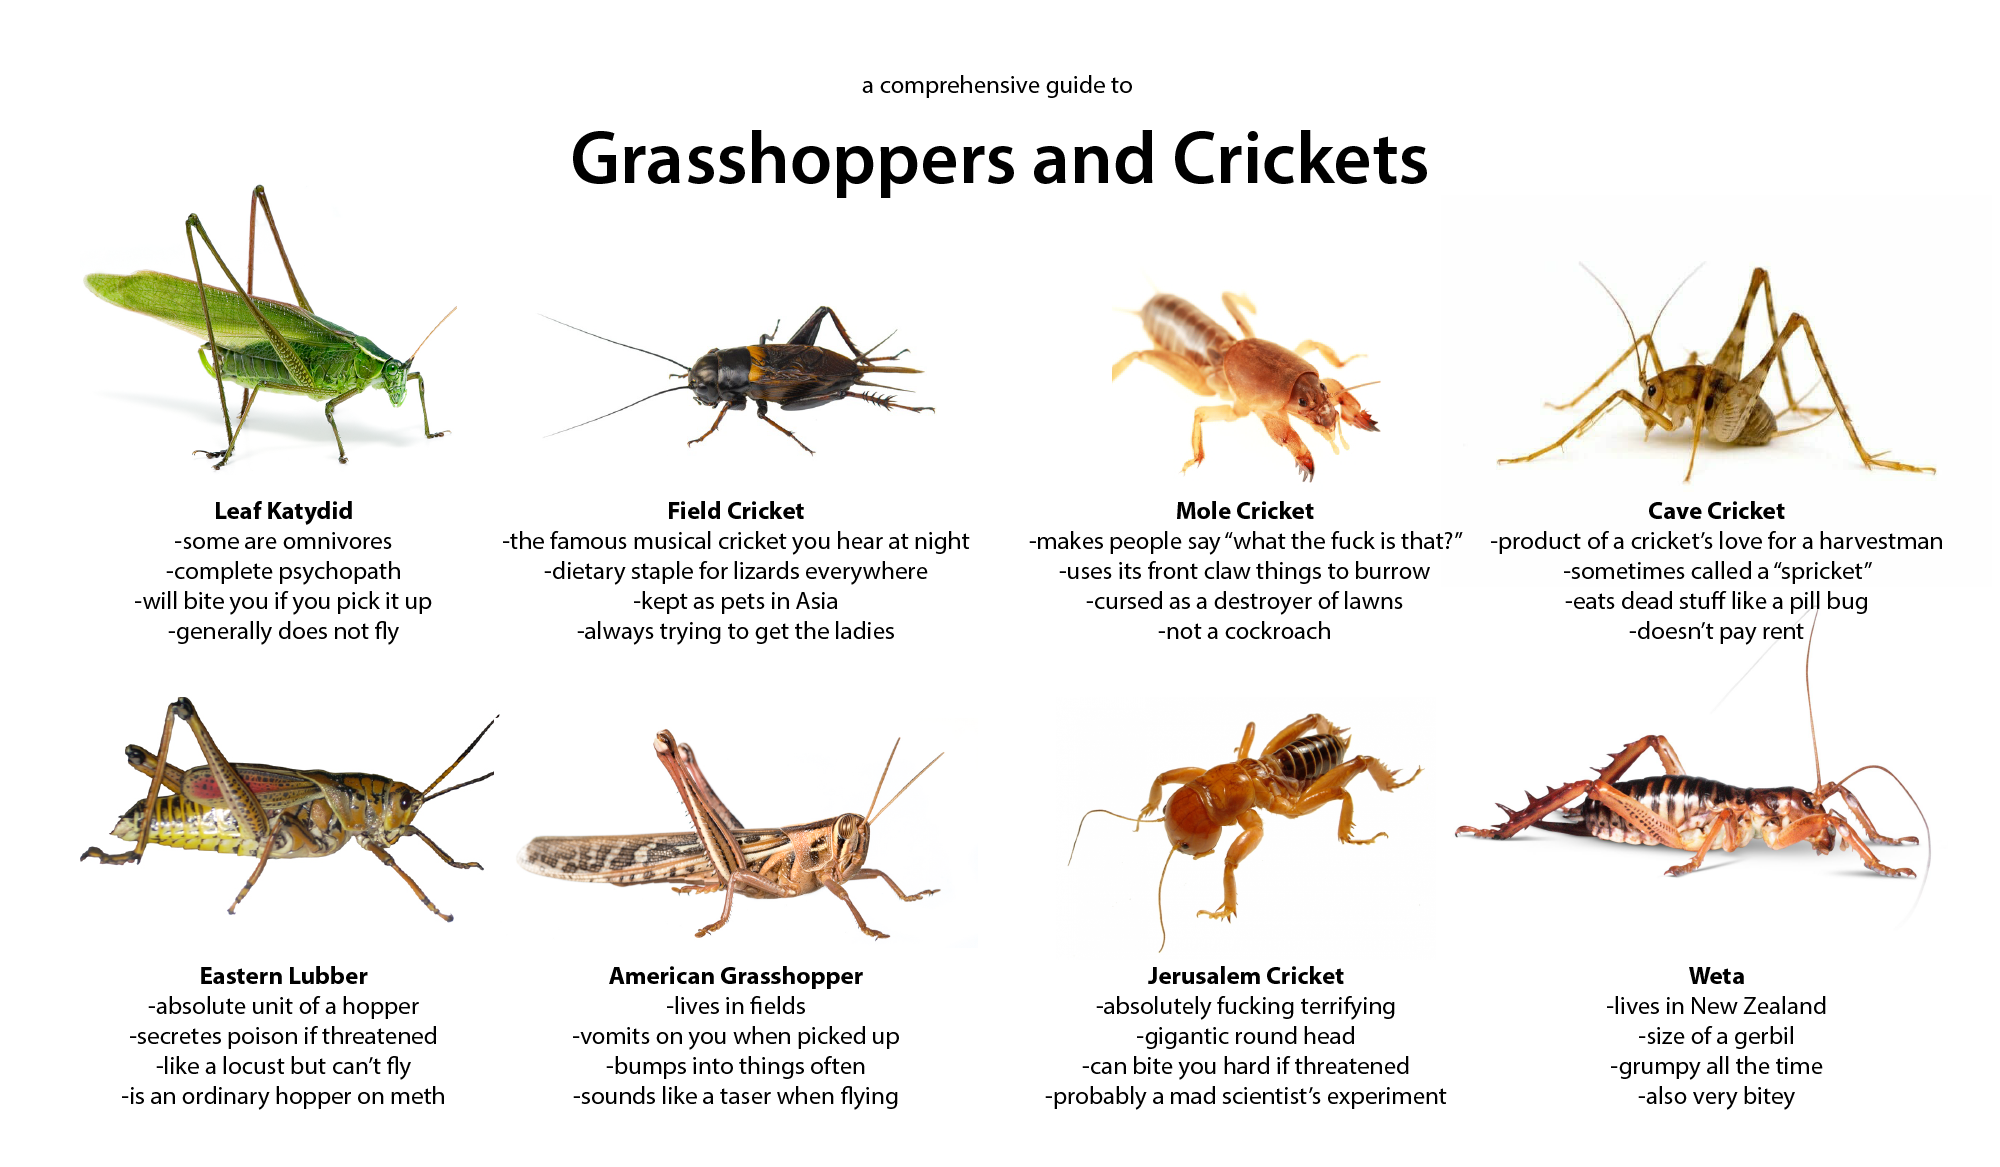 Grasshoppers And Crickets Grasshopper Cricket Mole Cricket